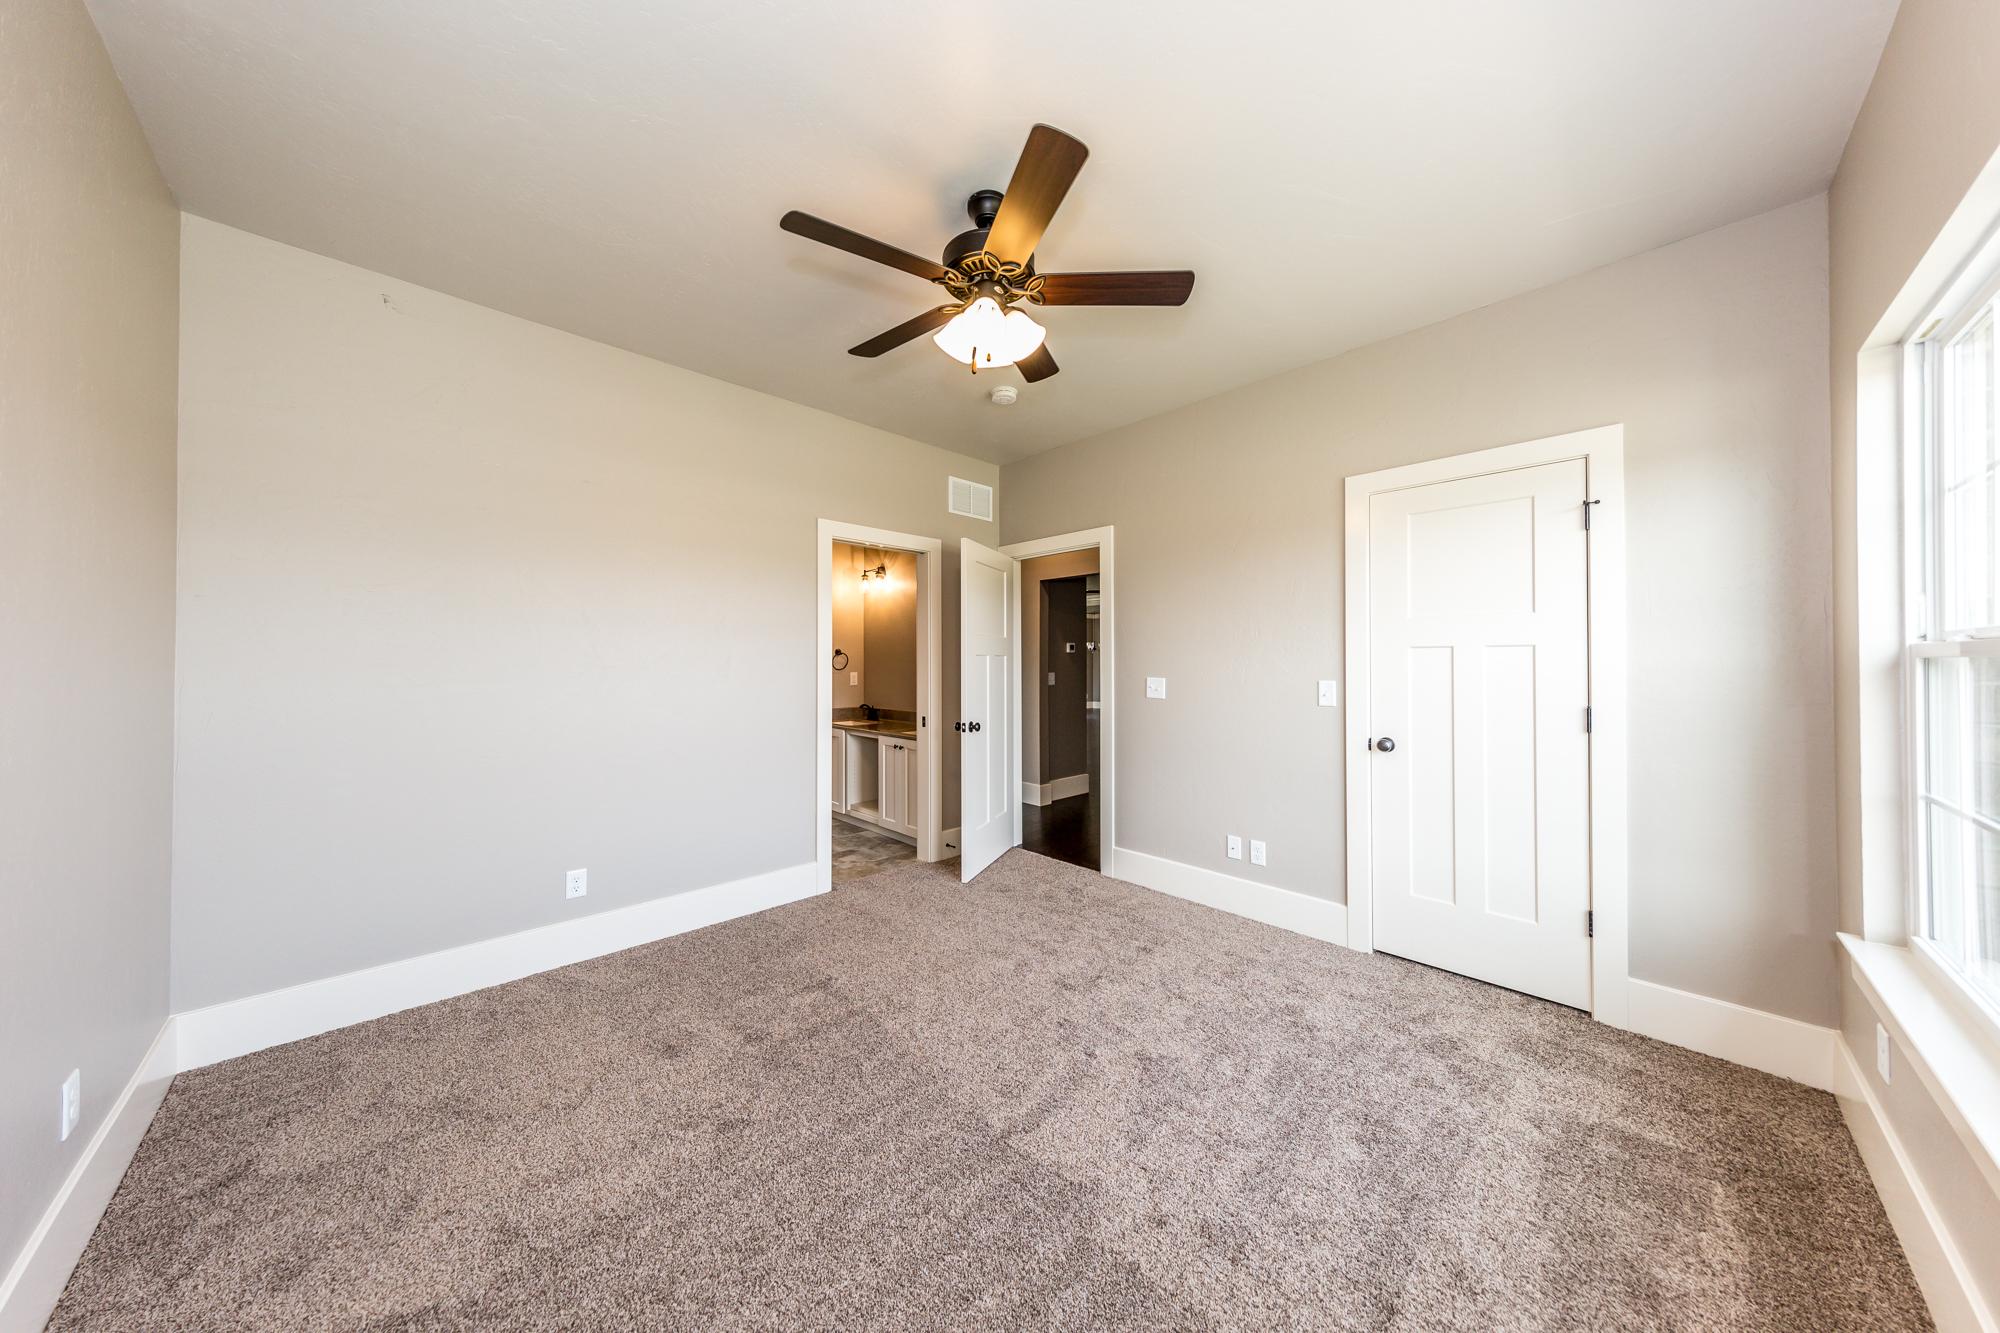 New-Construction-For-Sale-Bethel-Ridge-Farms-Scott-AFB-Illinois-29.jpg